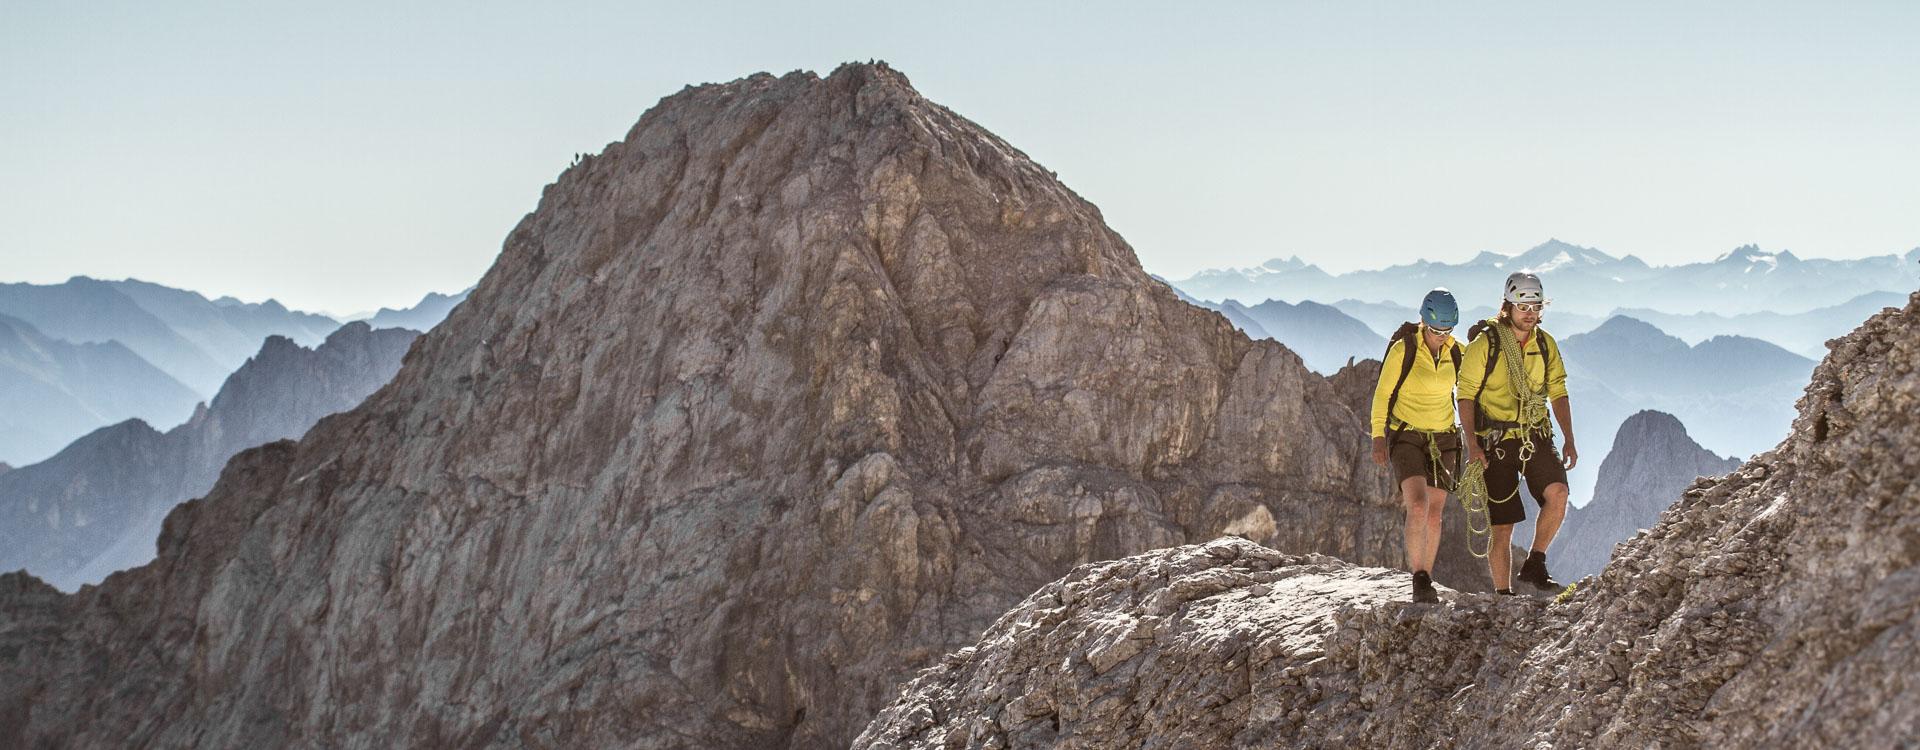 Klettern am Jubelgrat an der Zugspitze